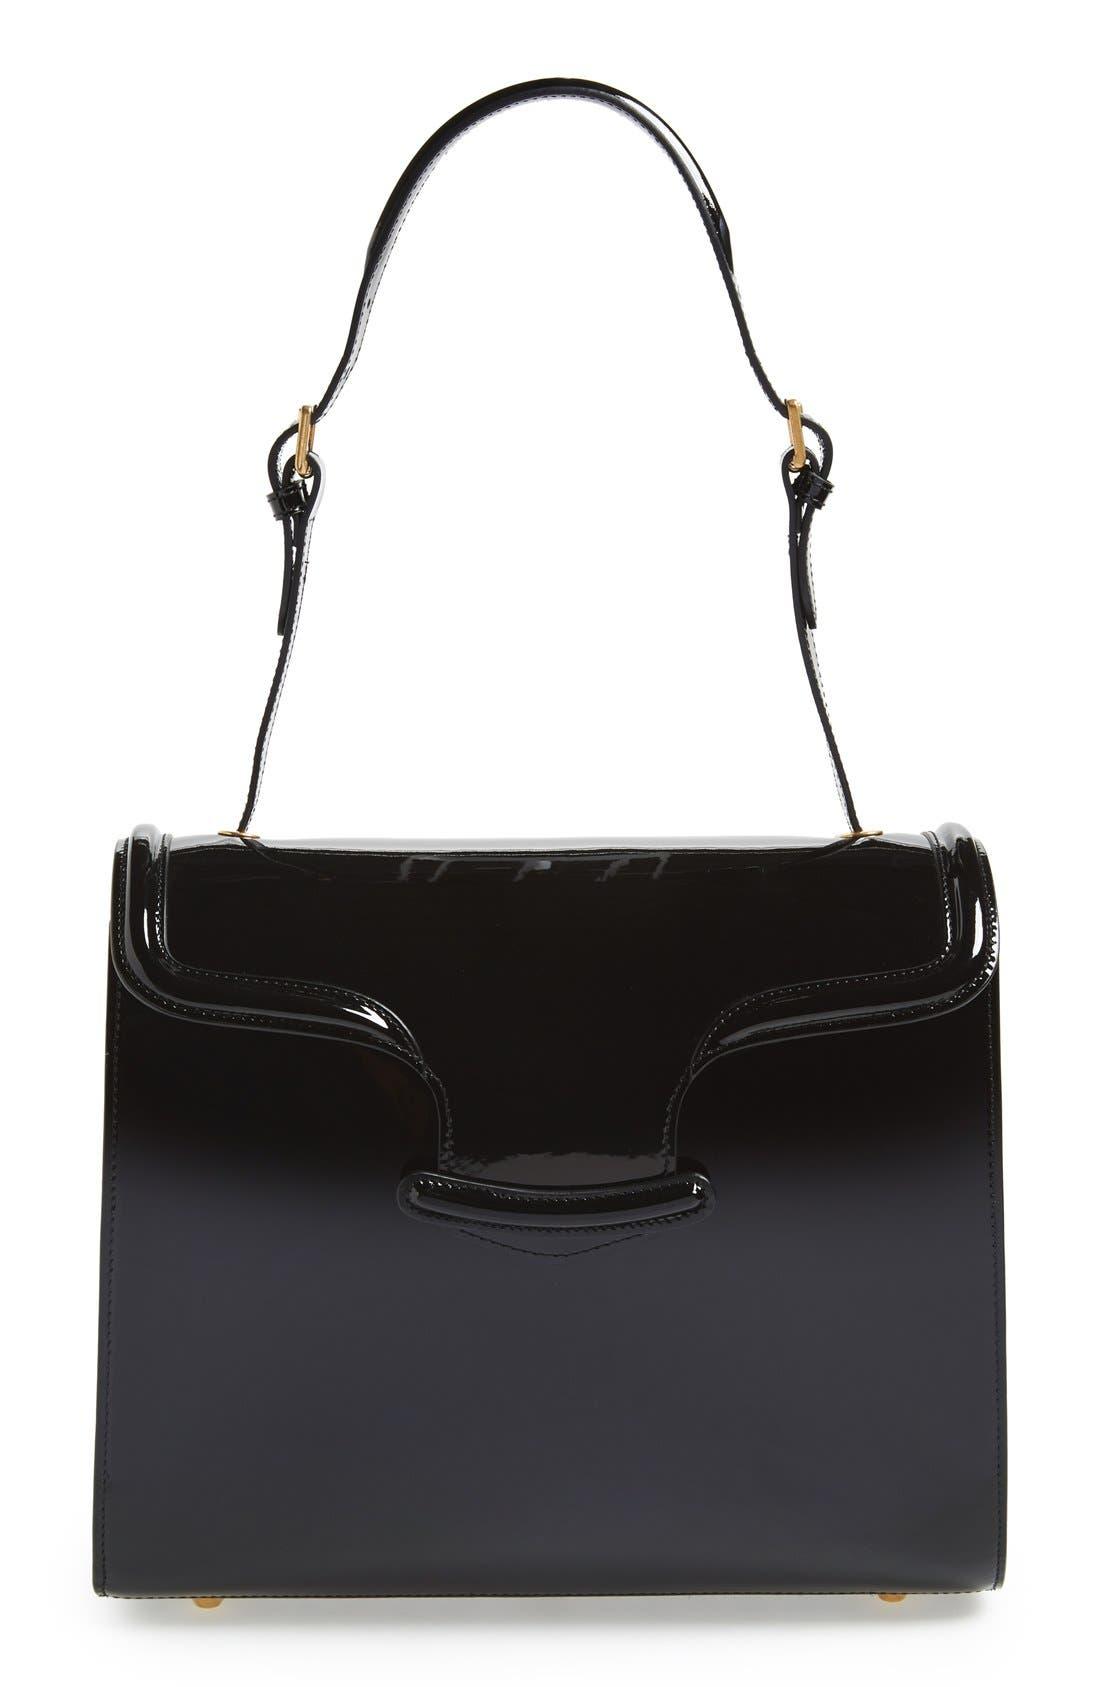 Alternate Image 1 Selected - Alexander McQueen 'Heroine' Patent Leather Shoulder Bag